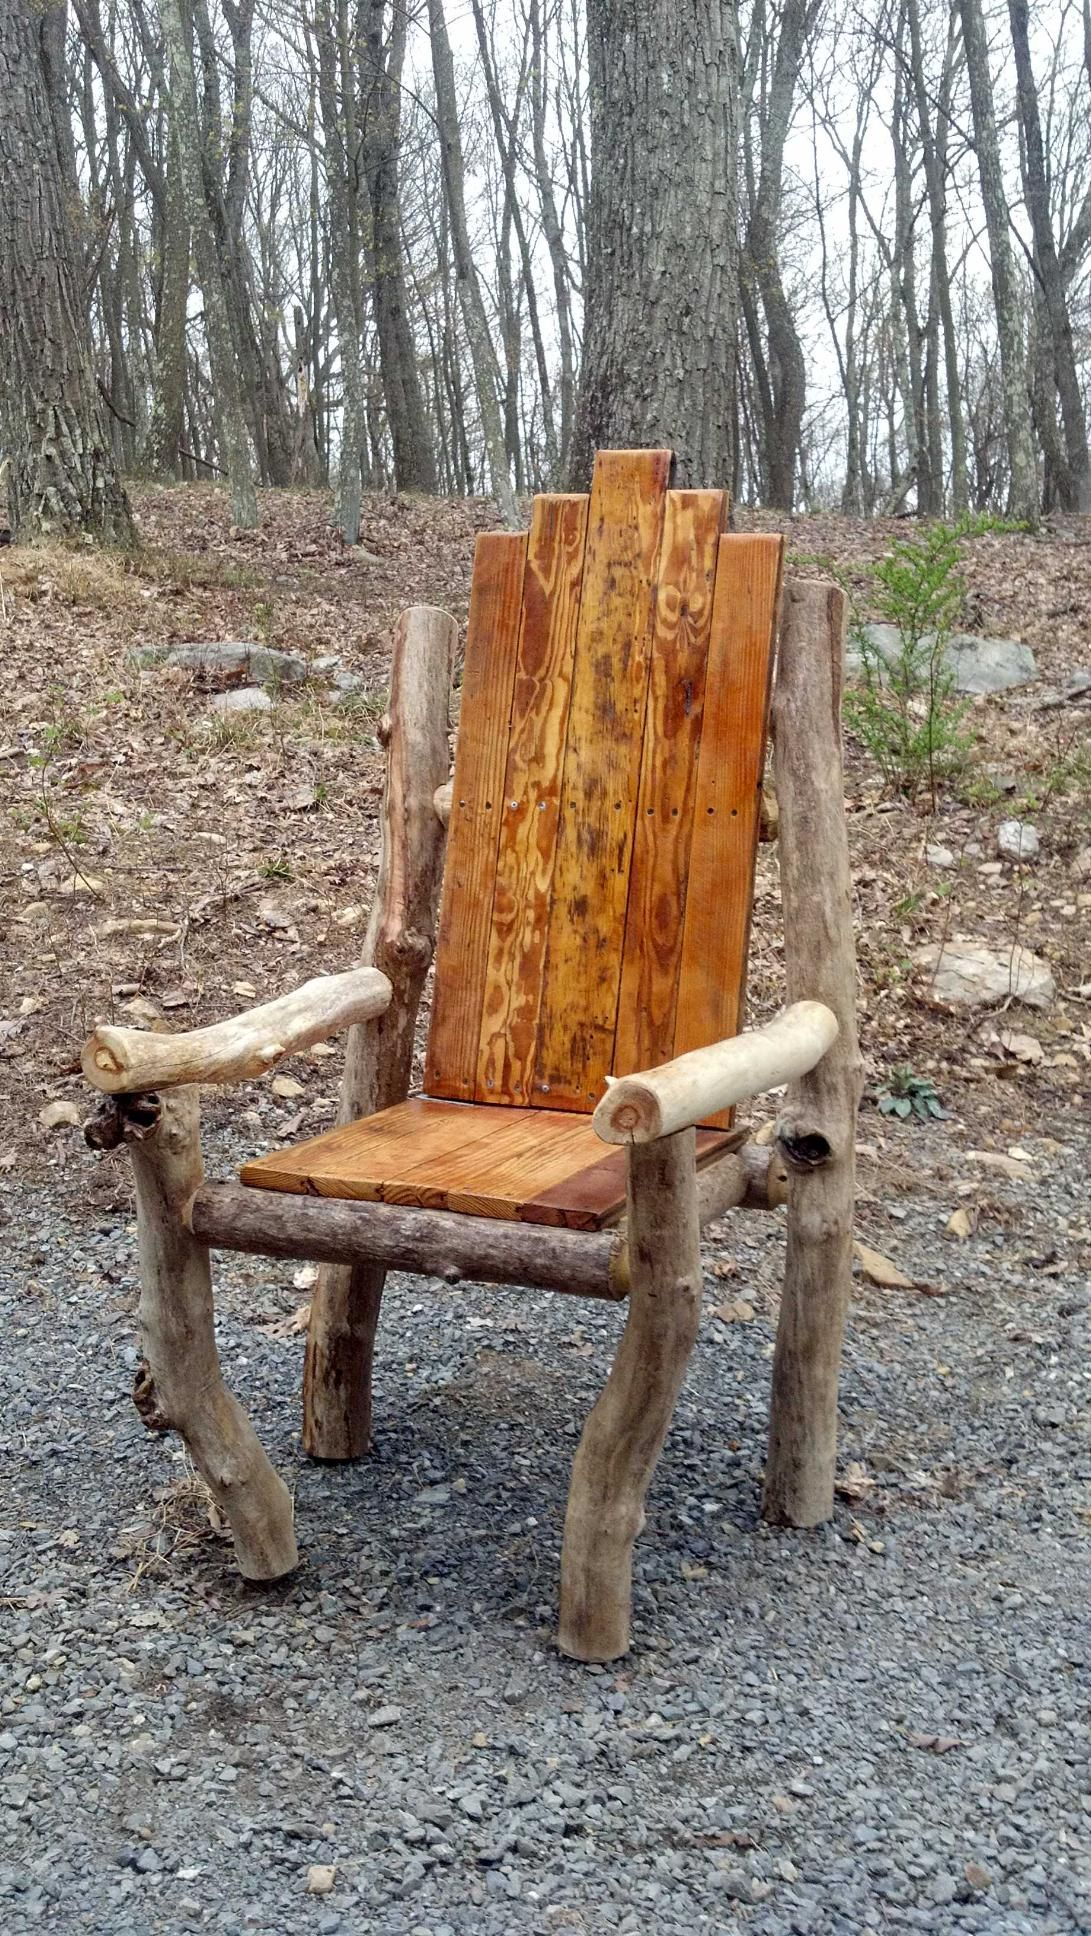 Stuhl Aus Esten Woodworking Rustic